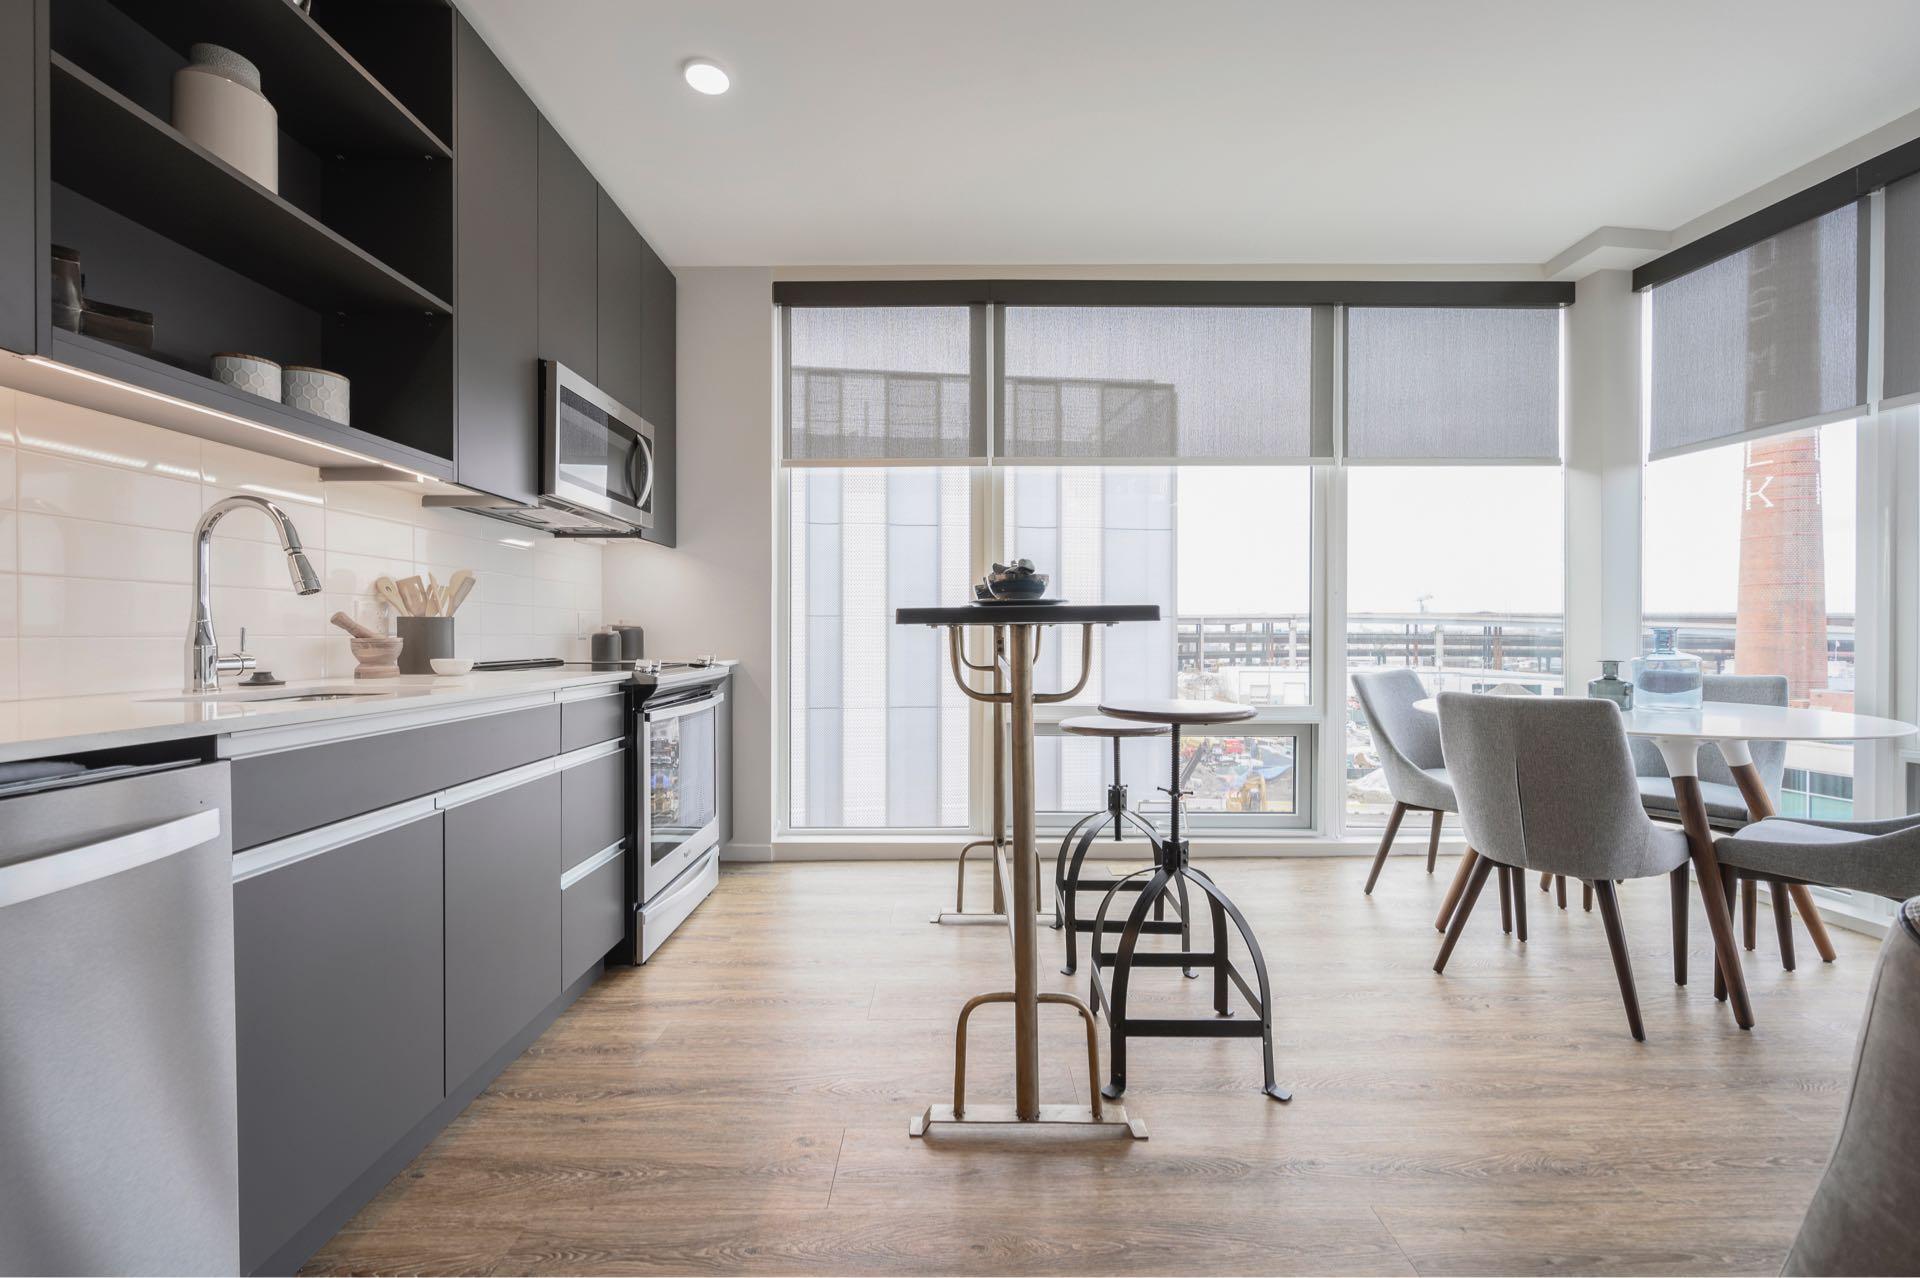 Apartments img 27